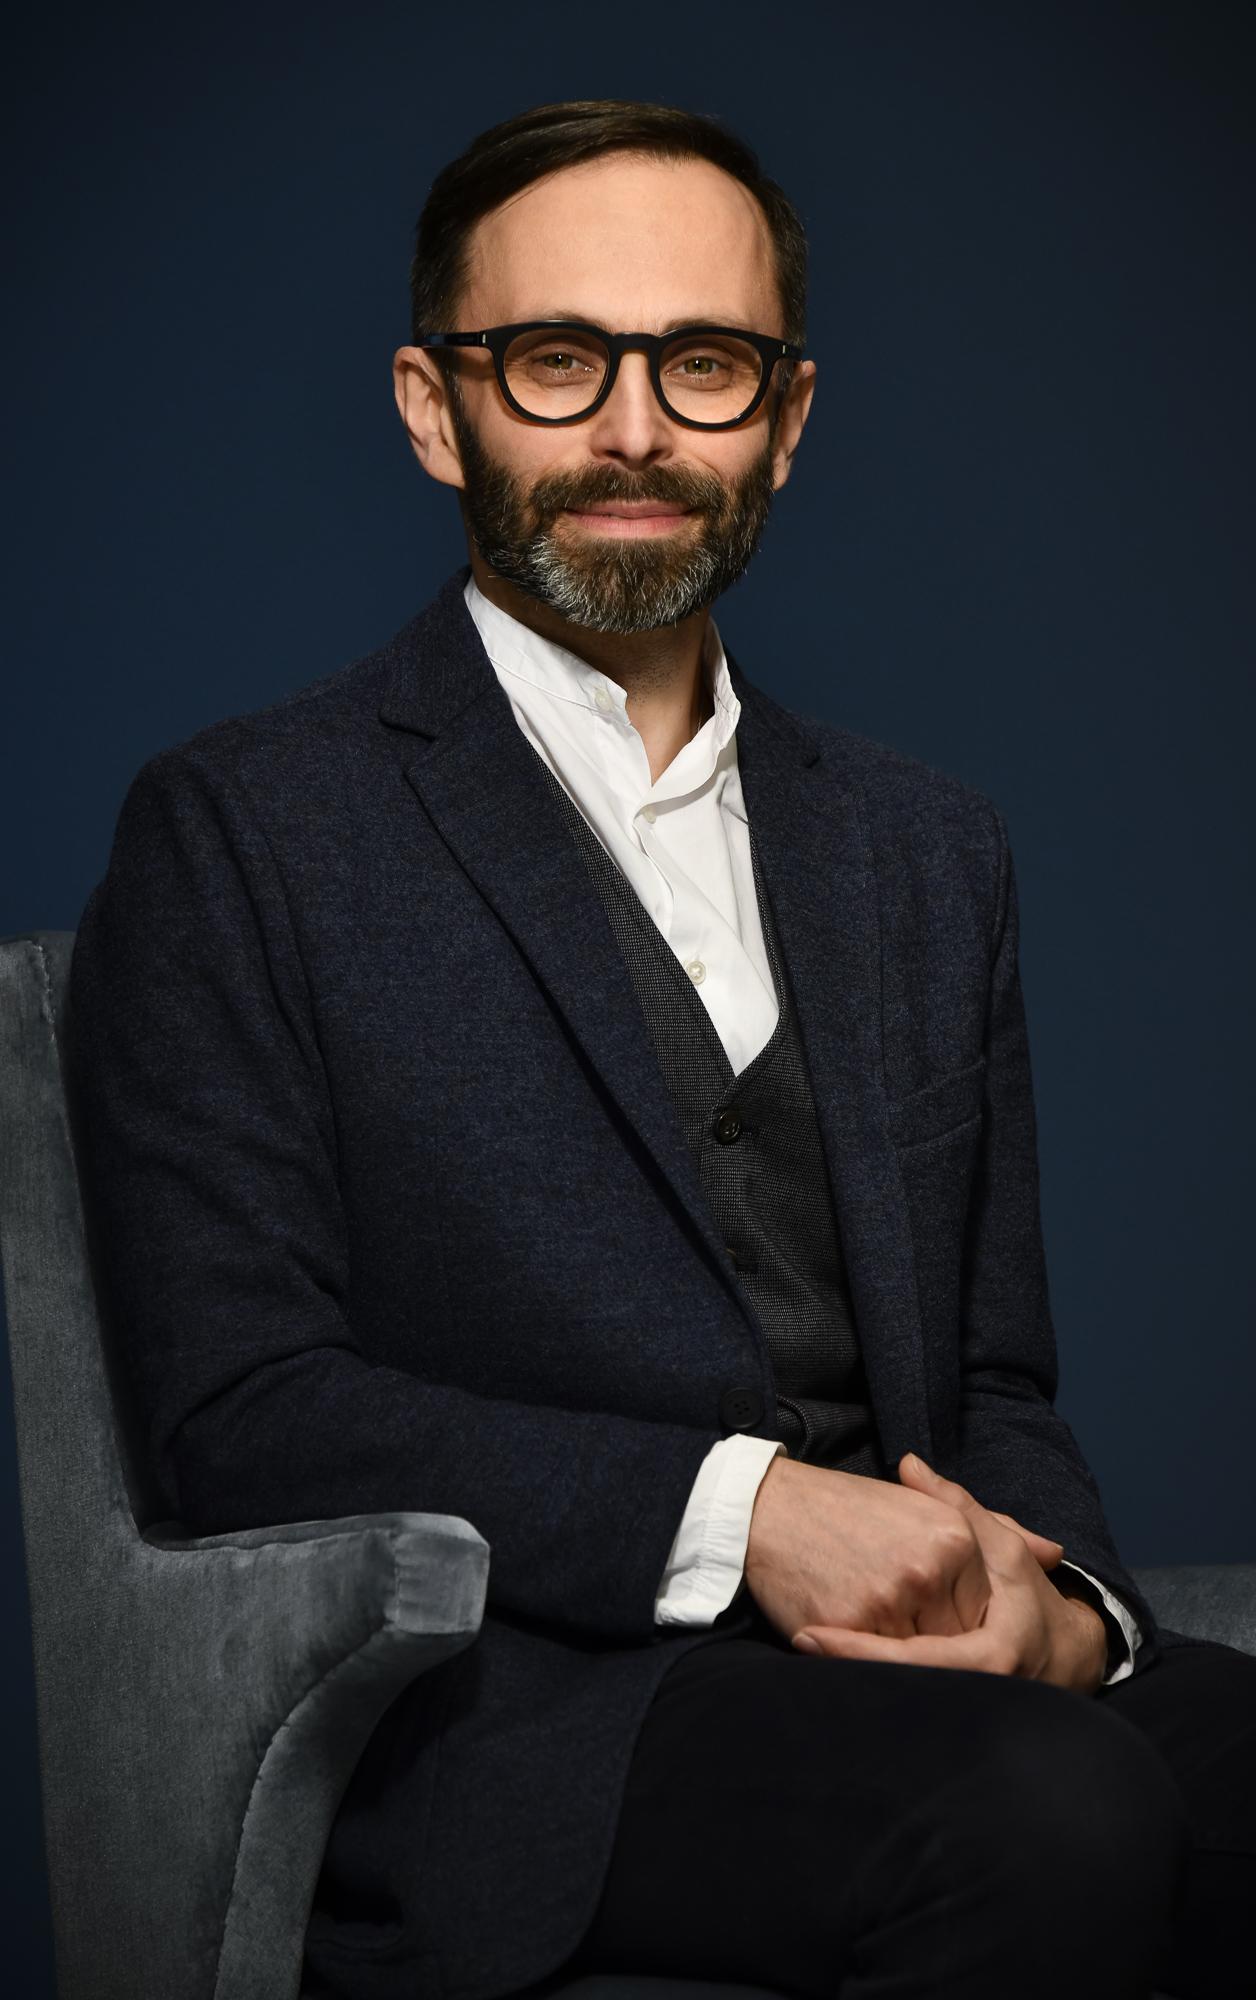 Jiří Heřman